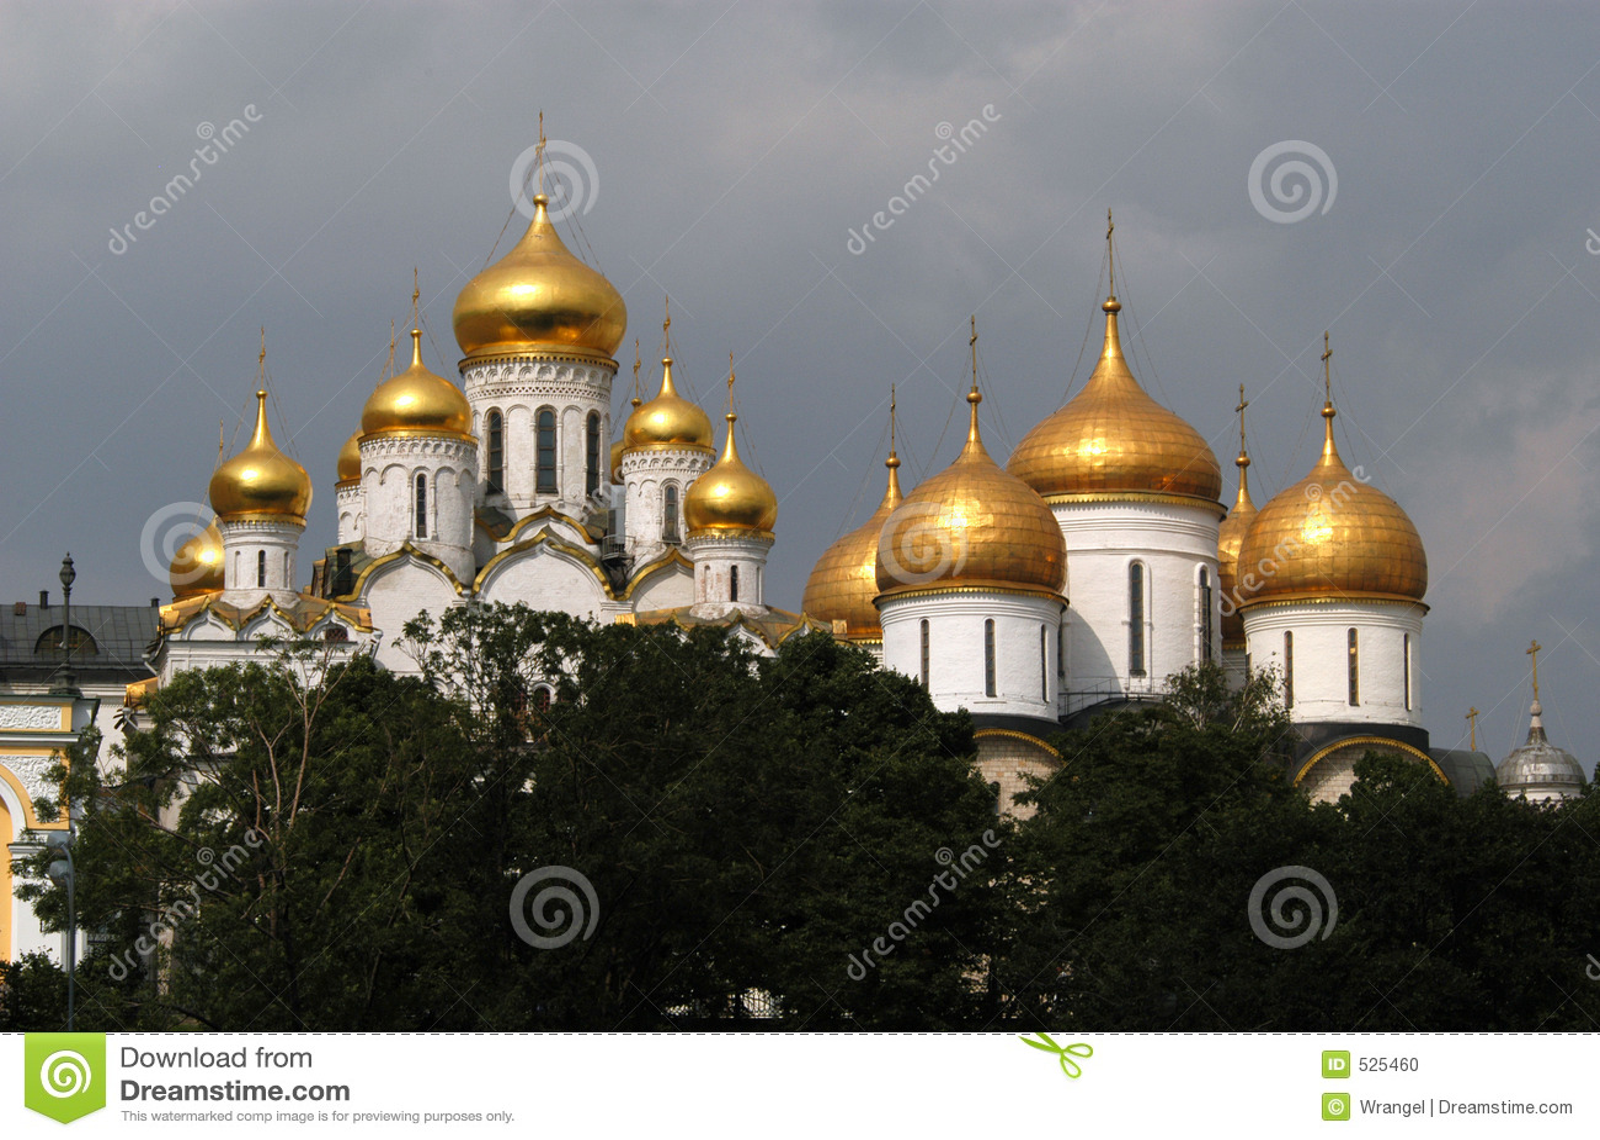 Kremlin moscow